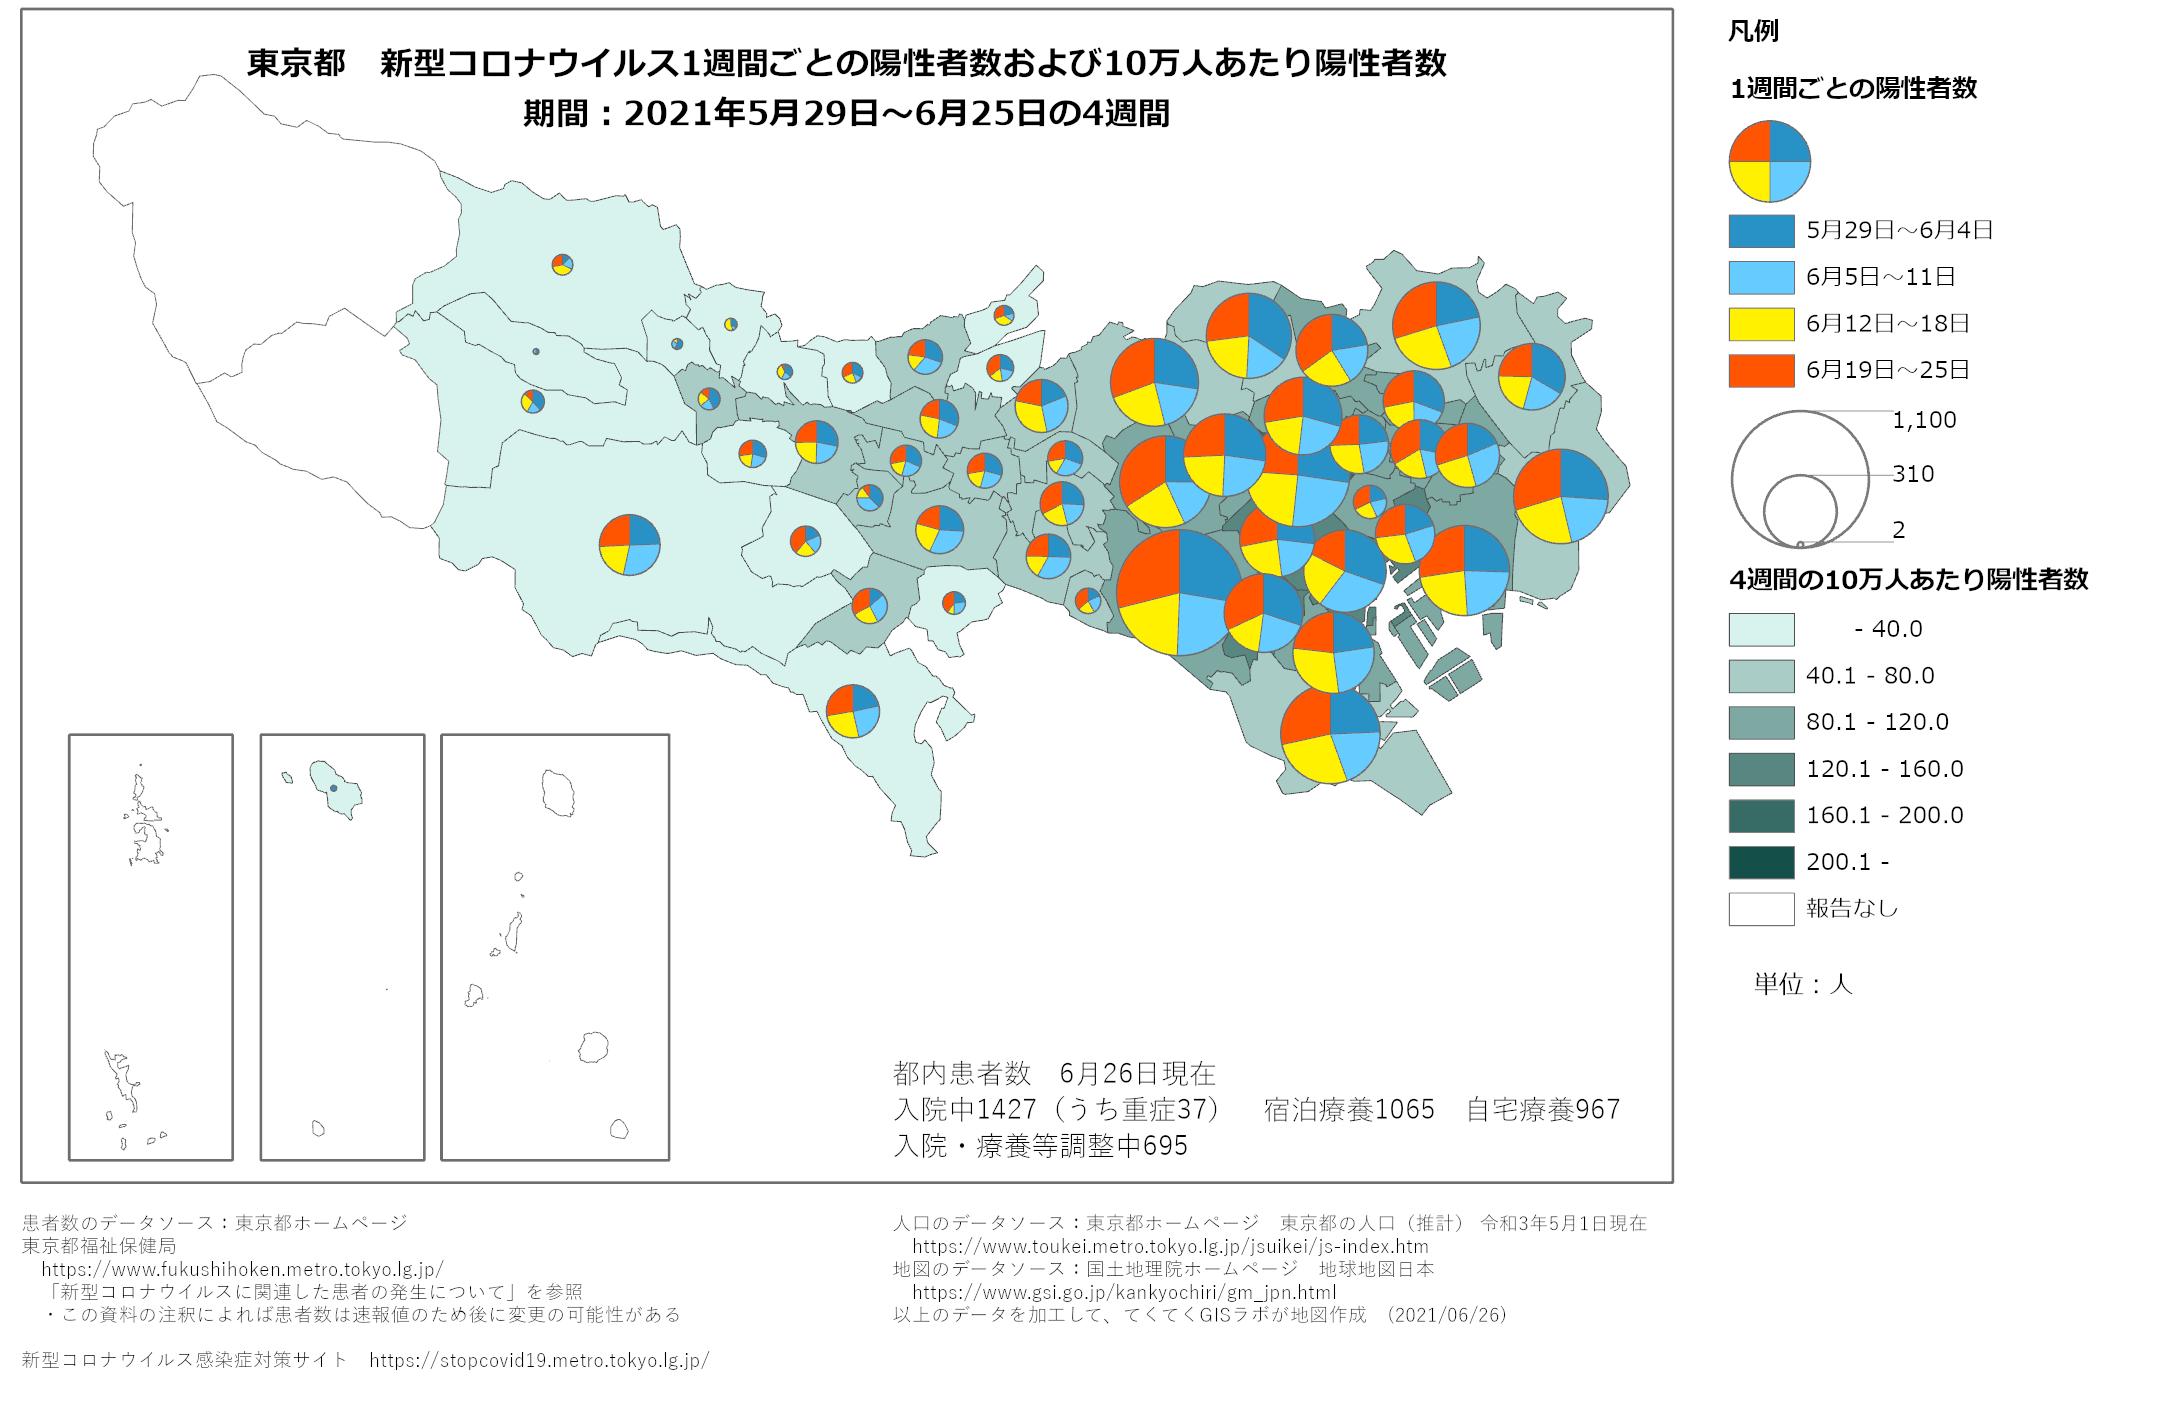 1週間ごと感染者数、東京都、5月29日〜6月25日